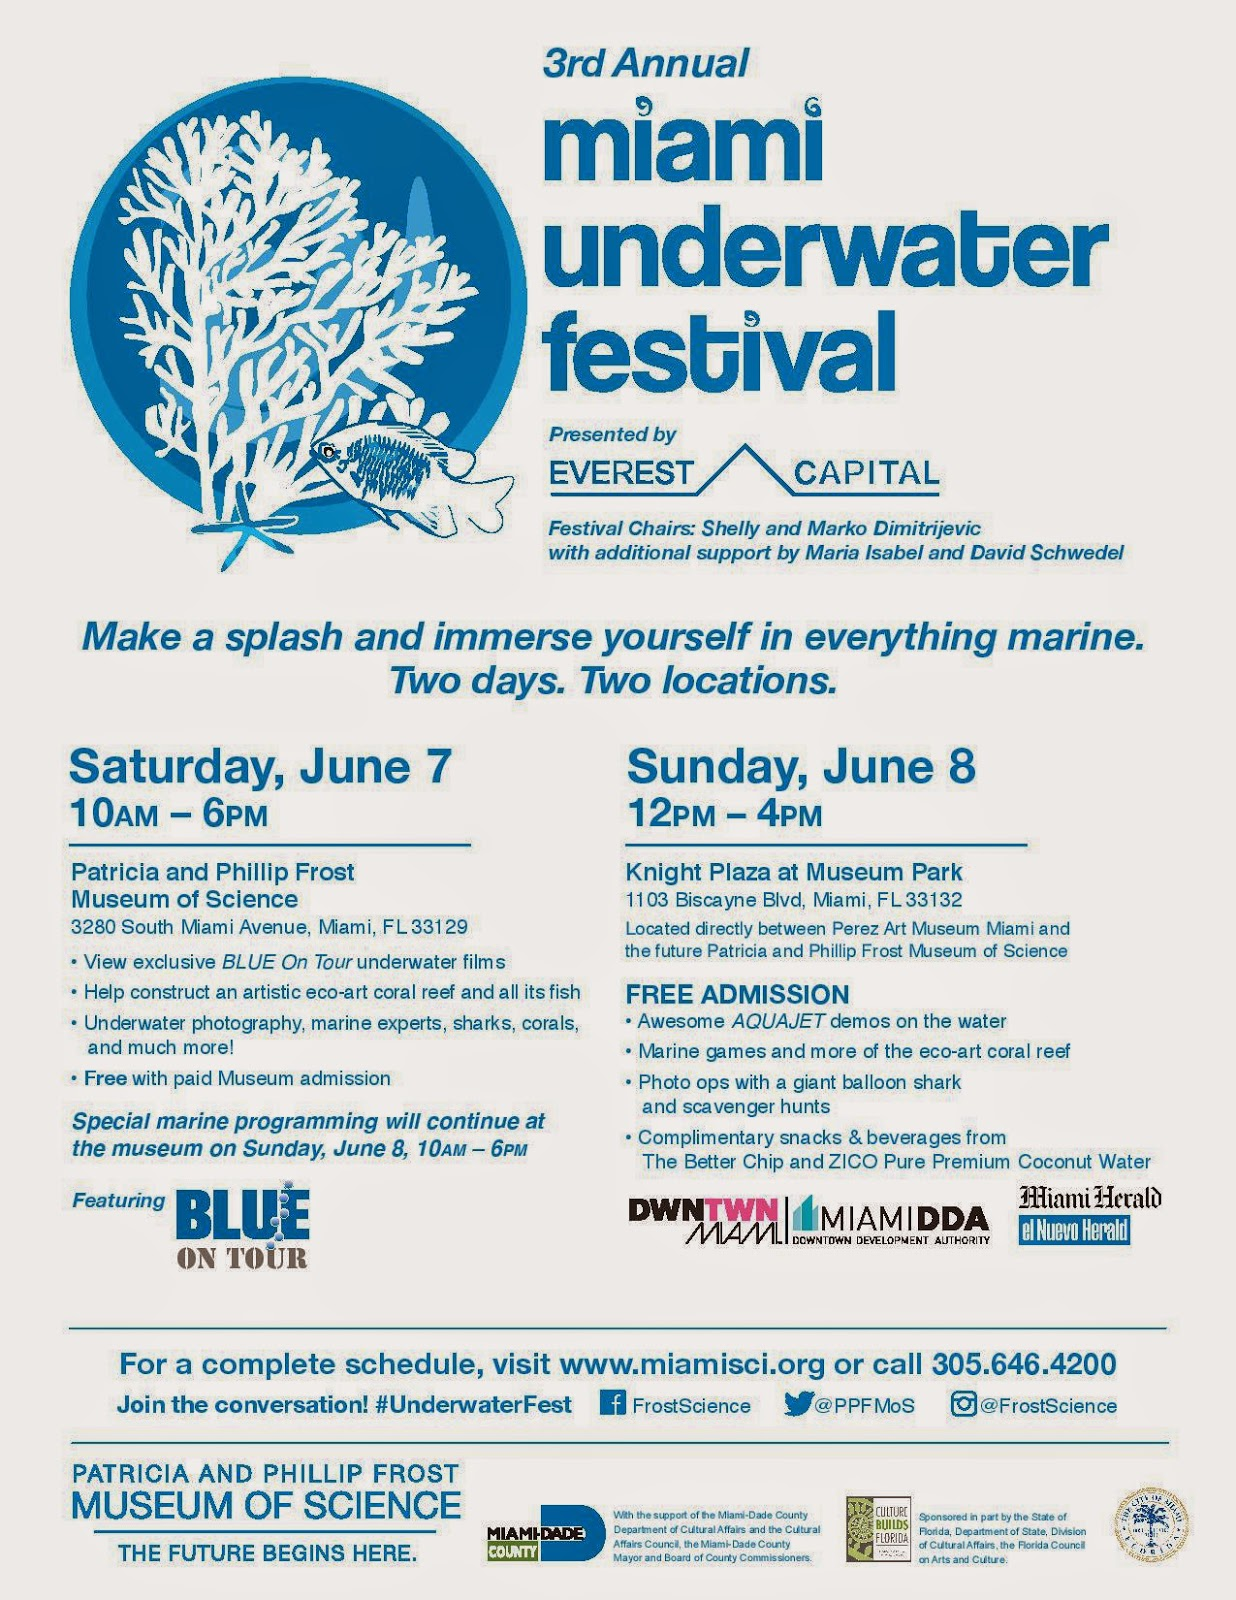 Underwater Restaurant Miami 3rd Annual Miami Underwater